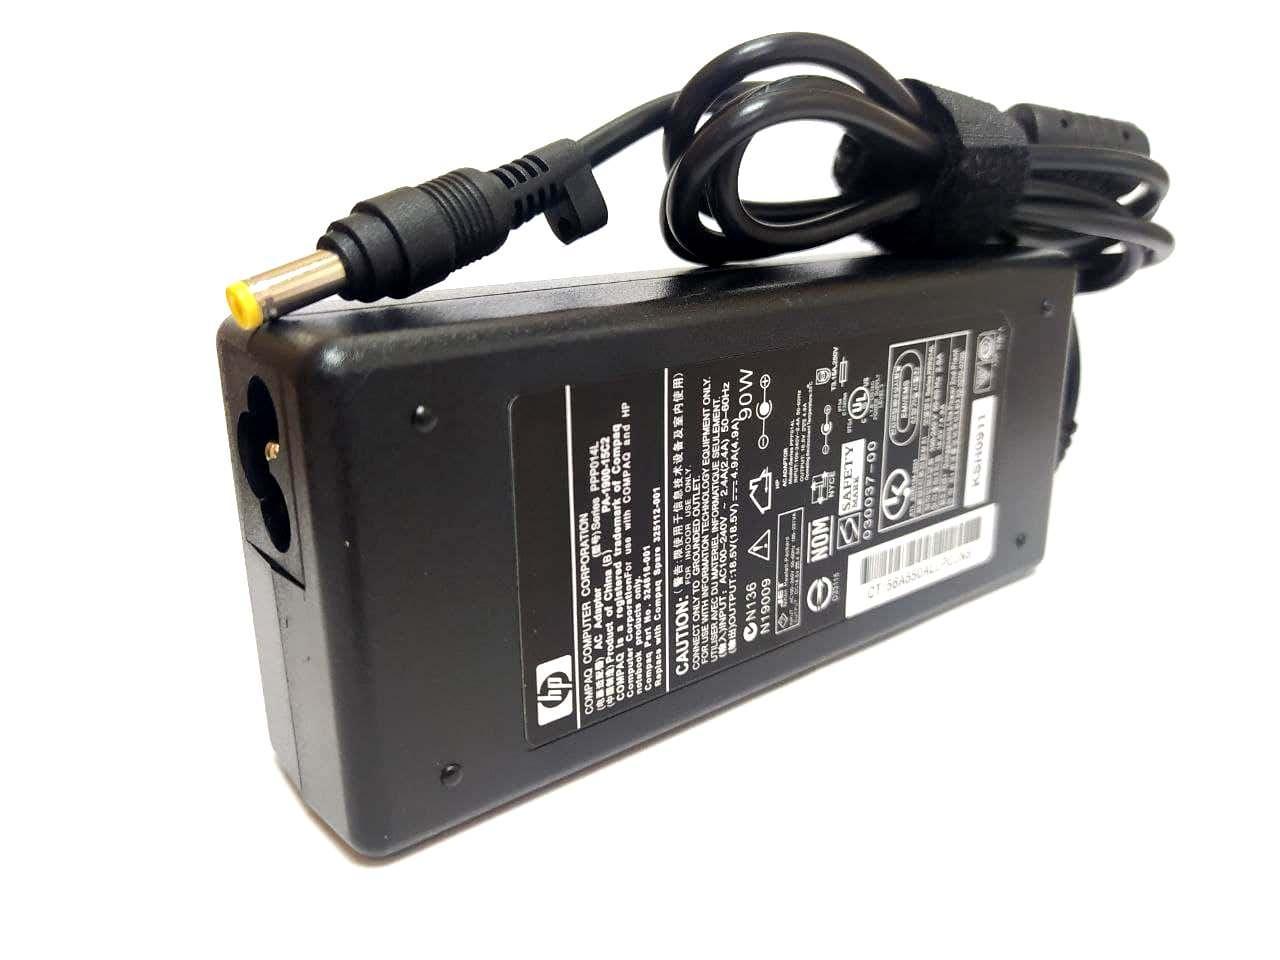 Блок питания для ноутбука HP Pavilion DV6000 18.5V 4.9A 4.8*1.7mm 90W